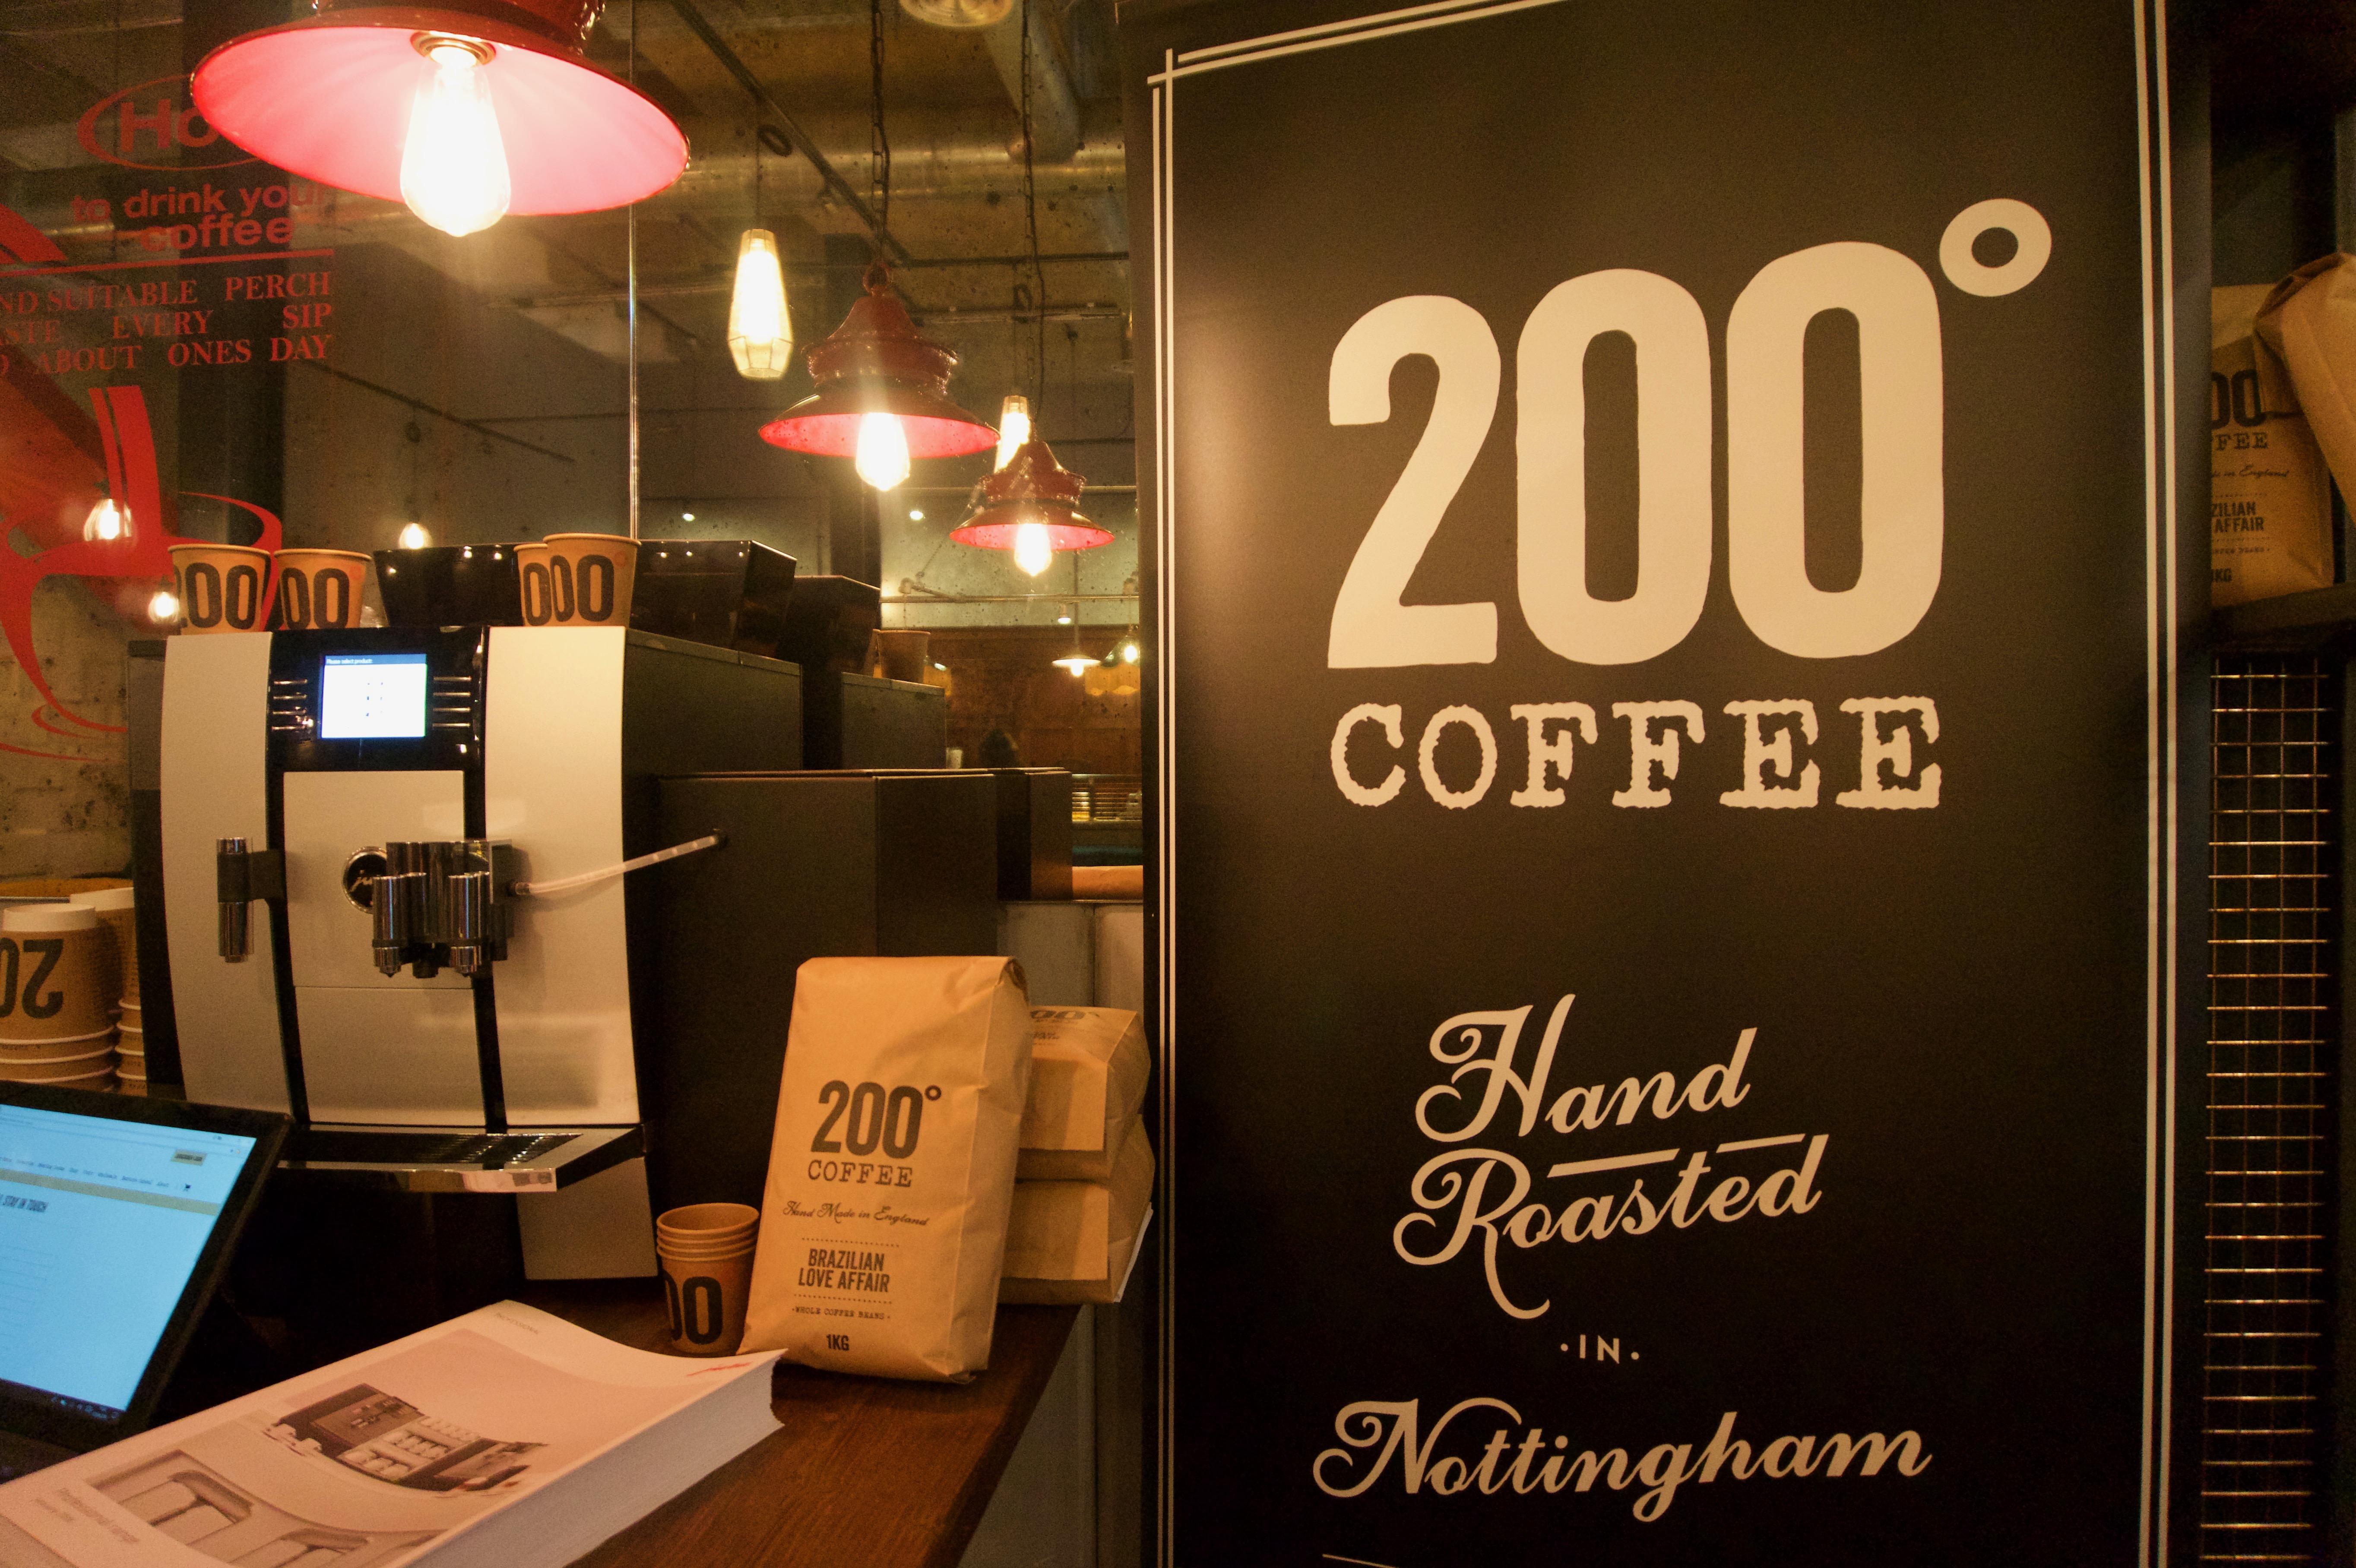 200 Degrees Coffee